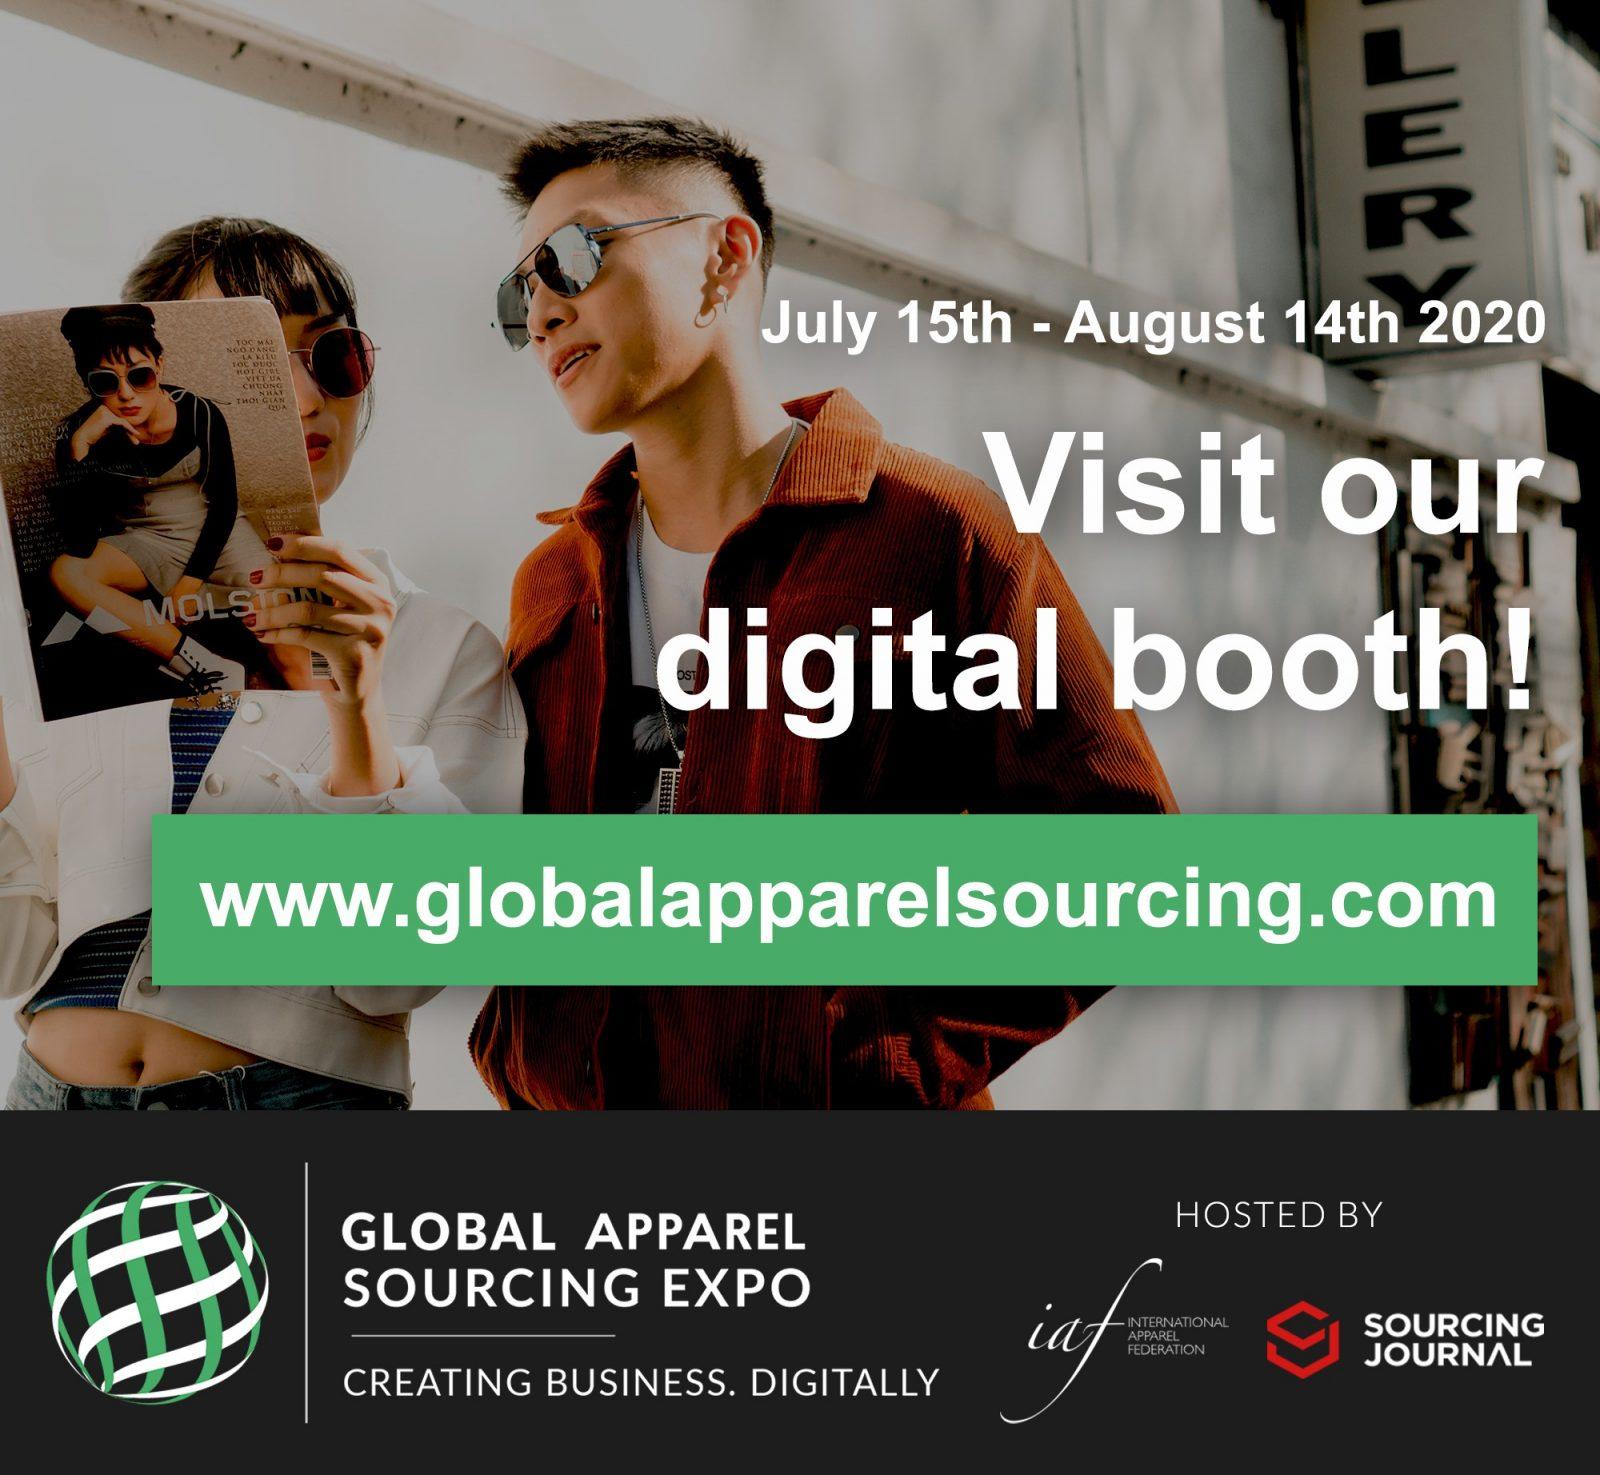 Digital Apparel Sourcing Expo